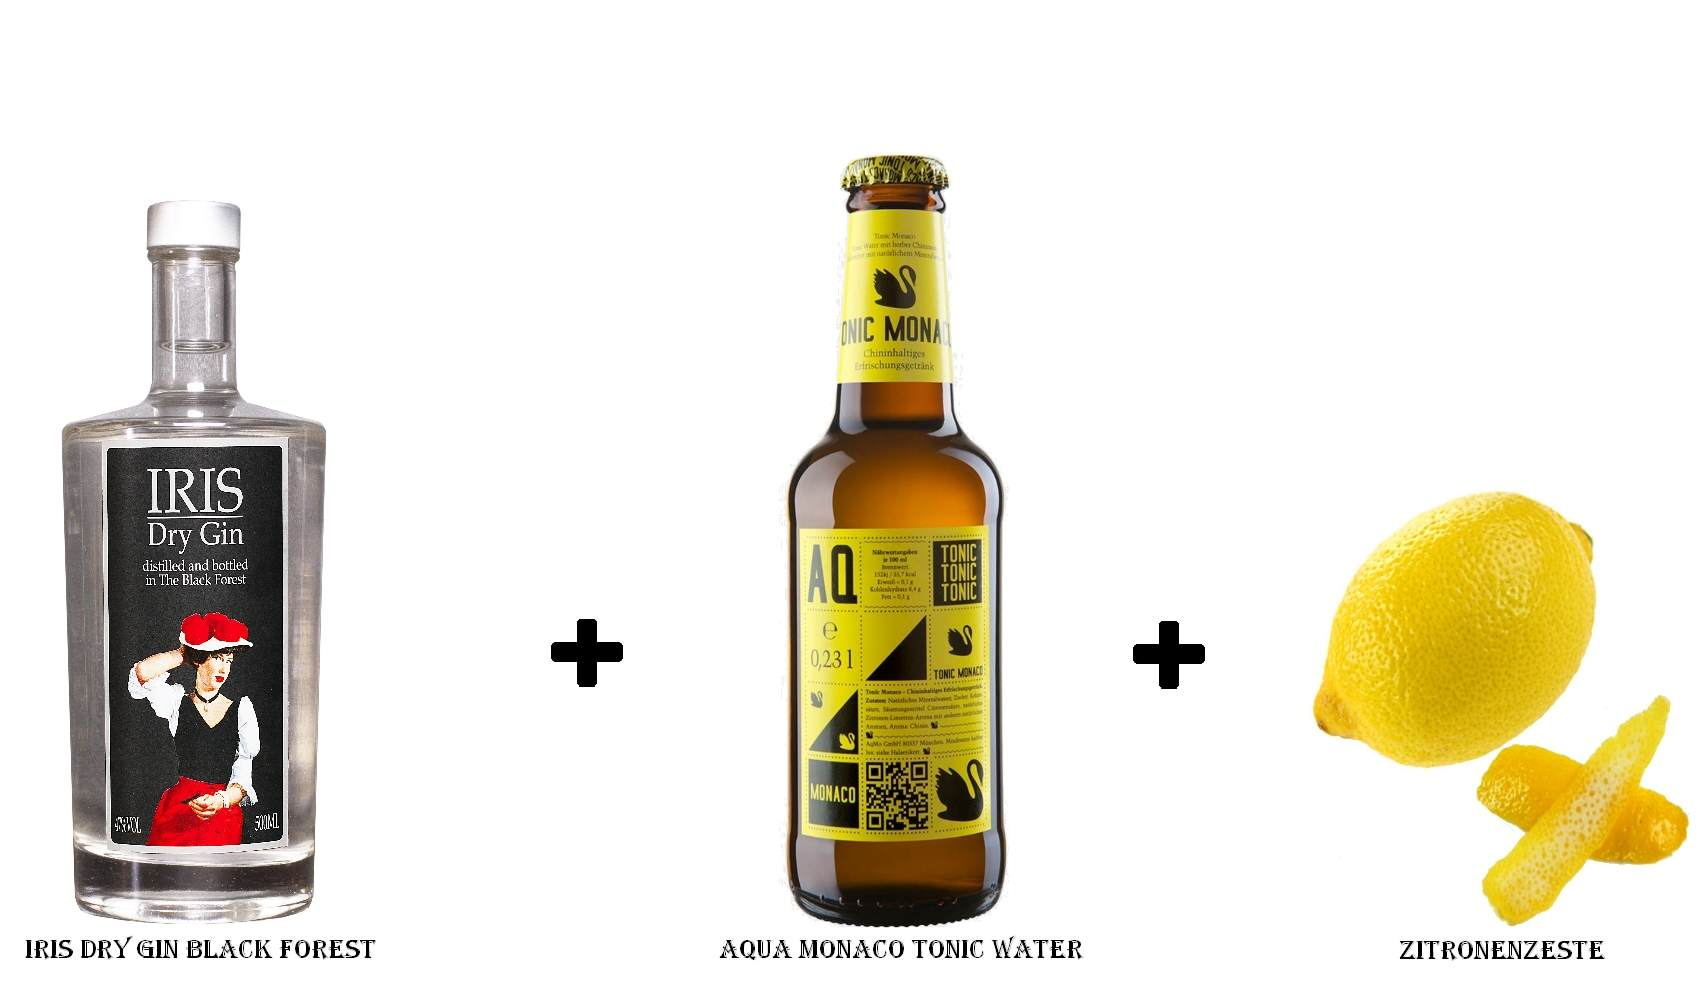 IRIS Dry Gin Black Forest + Aqua Monaco Tonic Water + Zitronenzeste